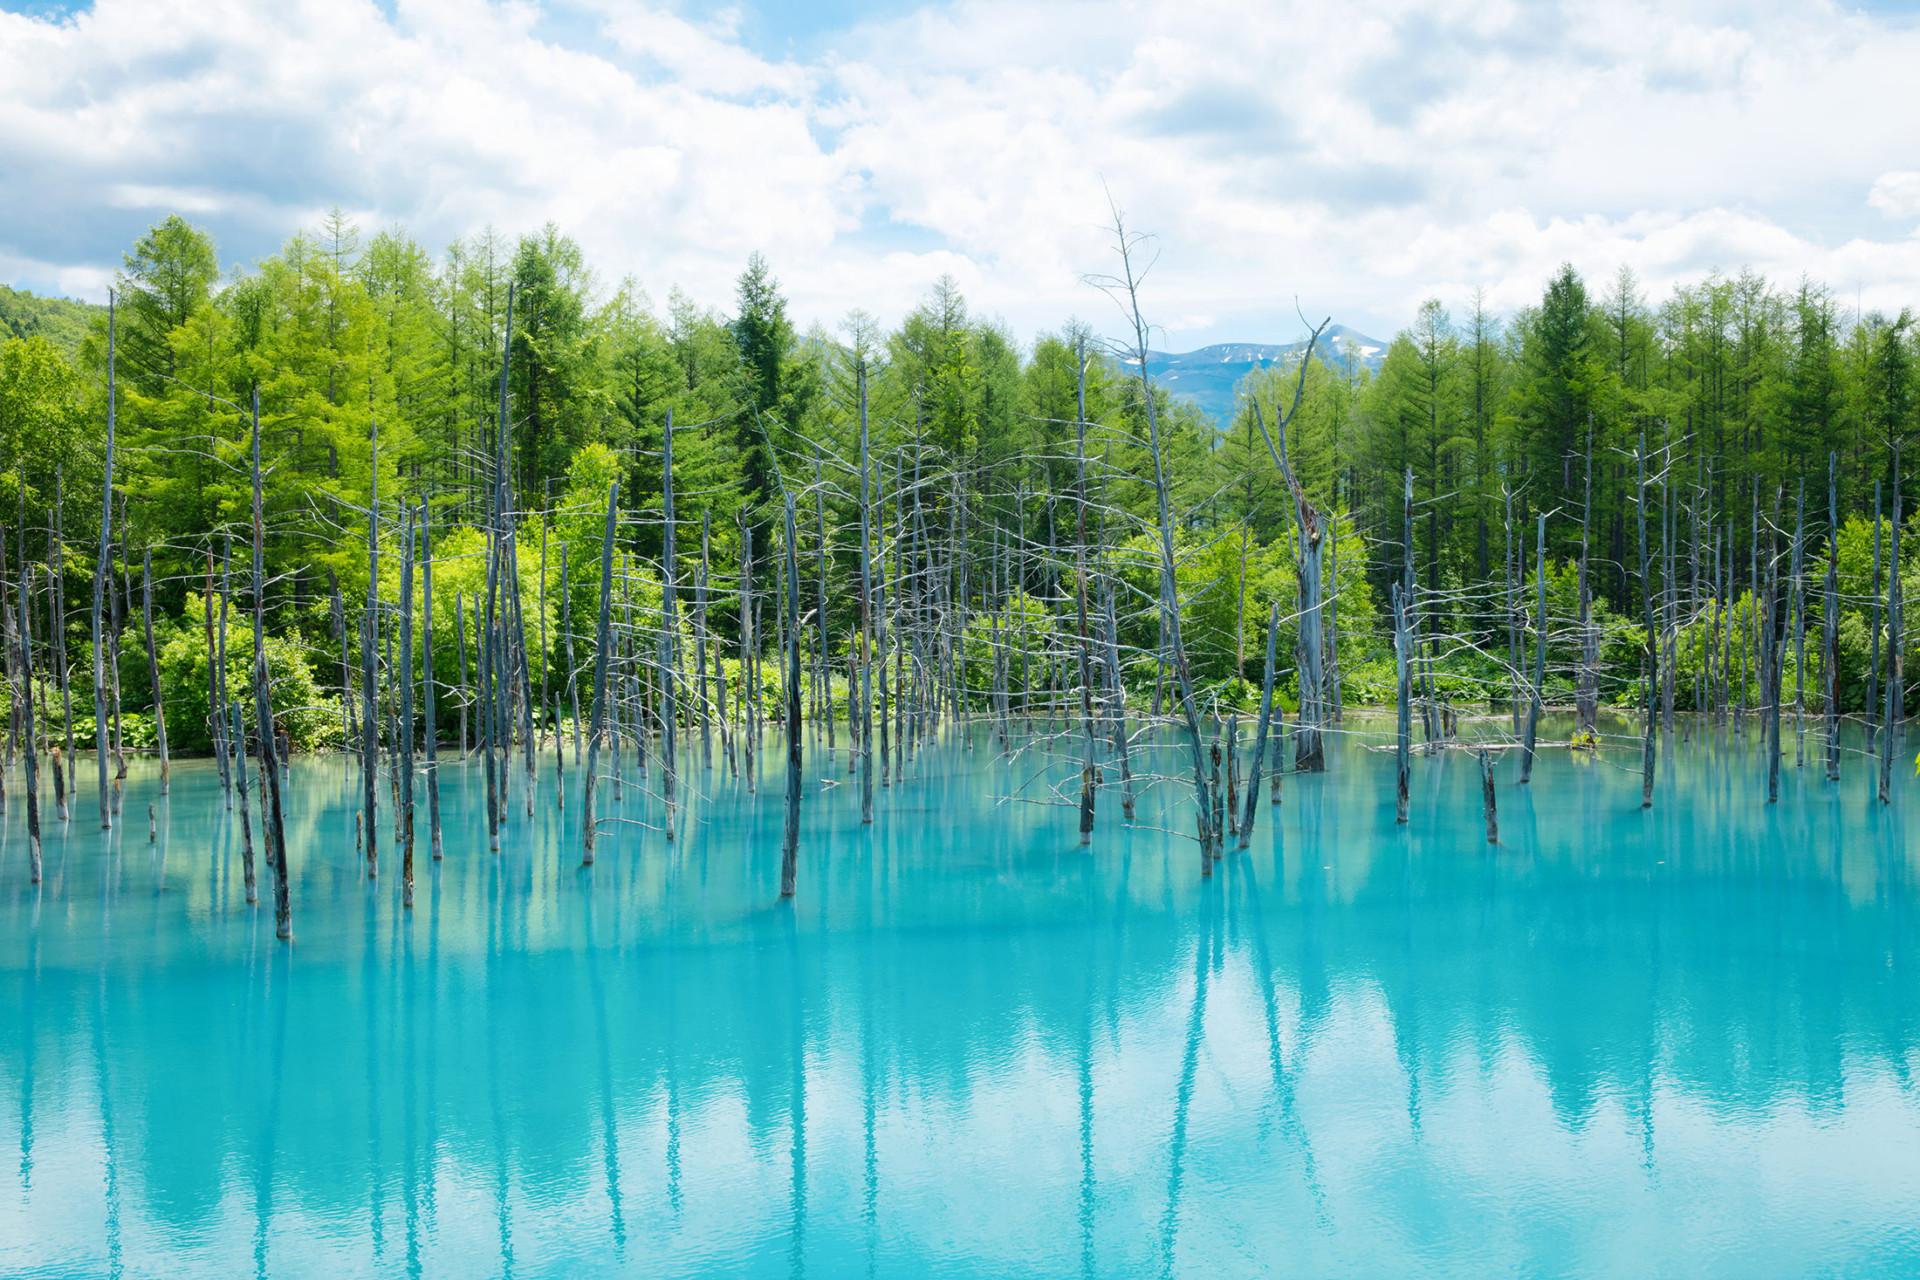 Shirogane Blue Pond